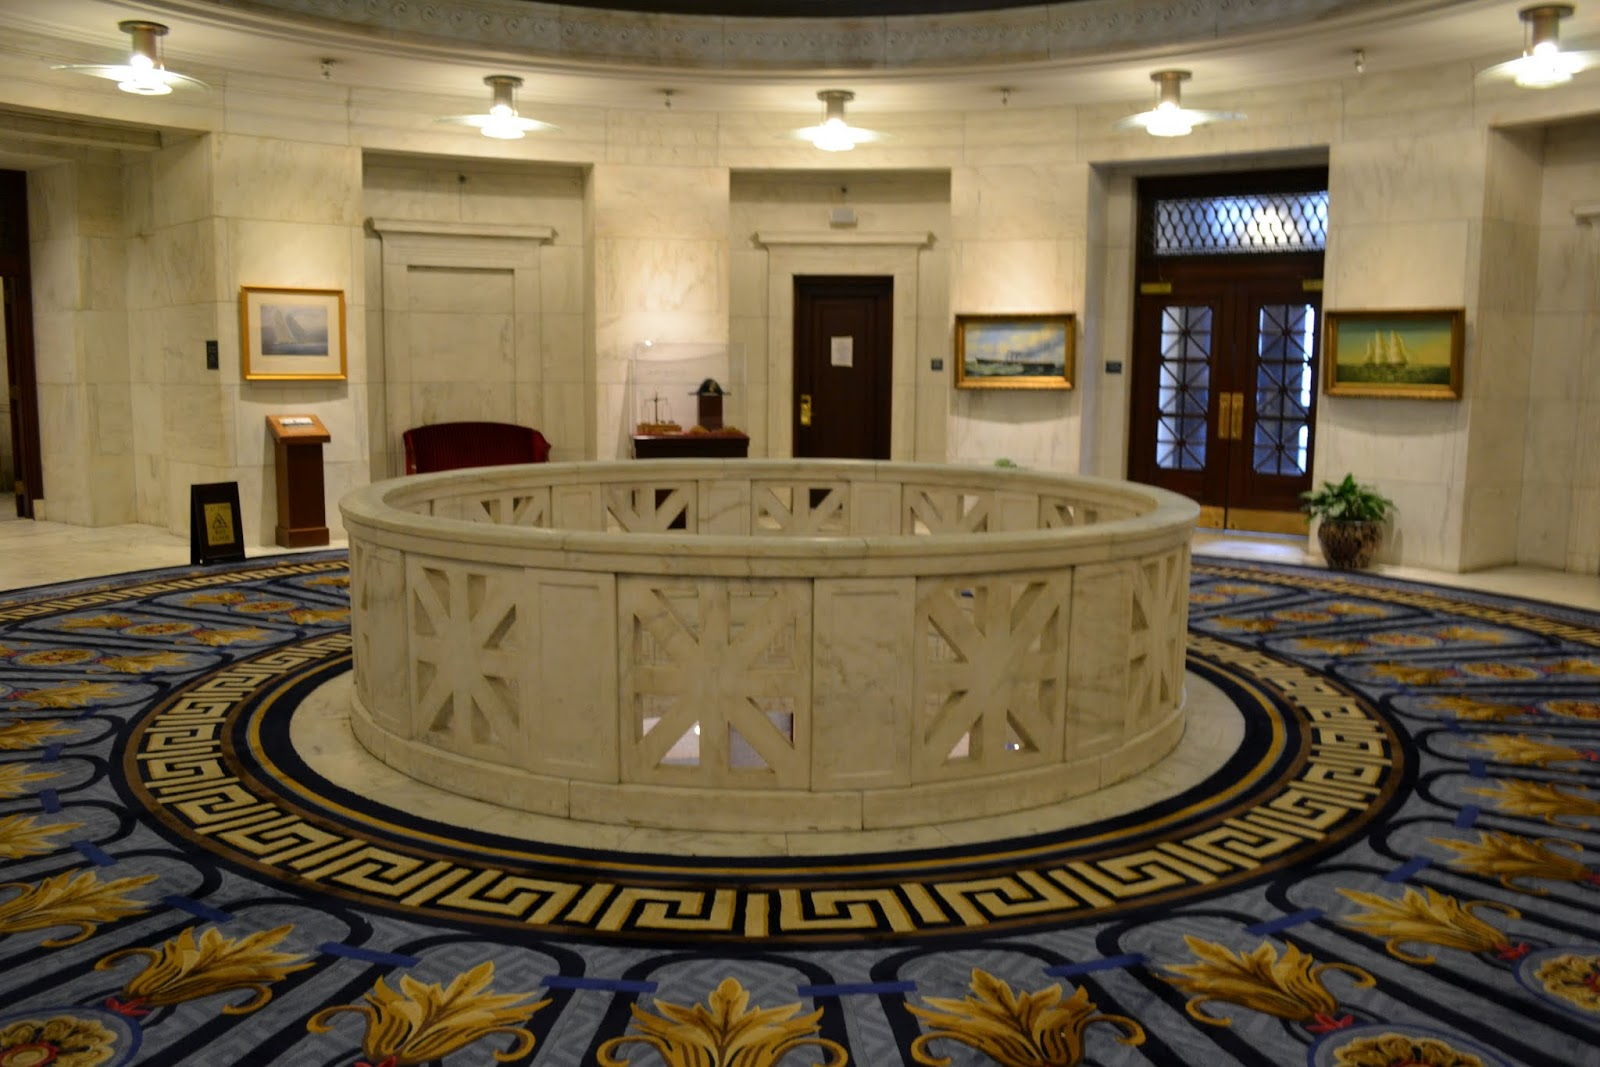 Cмотровая площадка в отеле Марриотт, Бостон, Массачусетс (Marriott Custom House observation deck, Boston, MA)